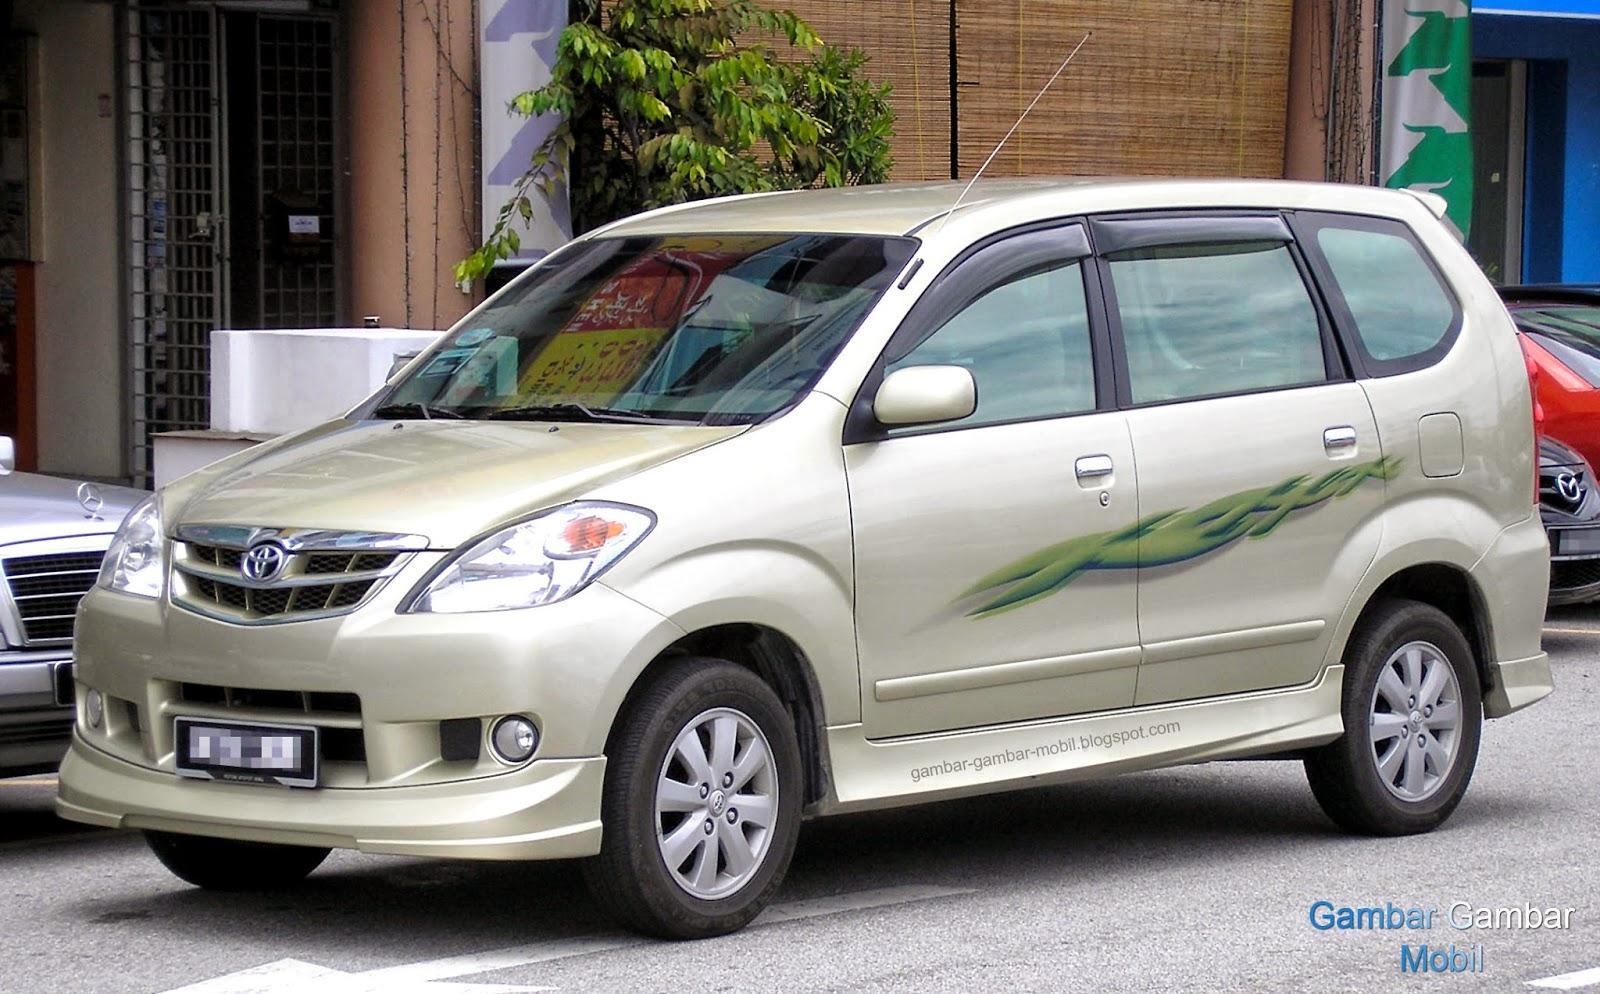 Gambar Mobil Avanza Tabrakan